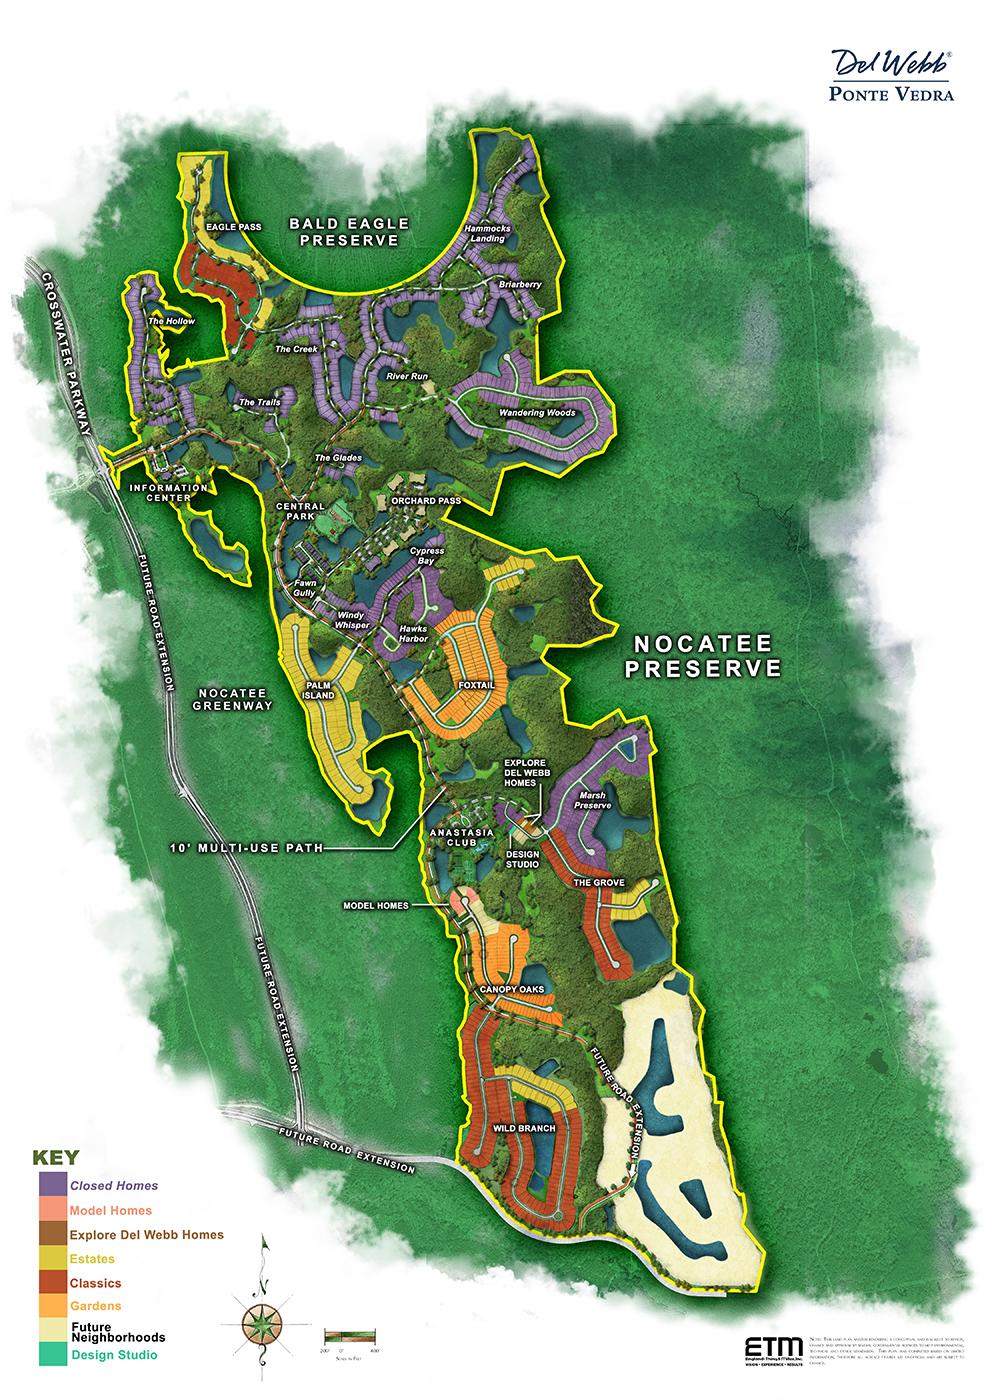 Del Webb Ponte Vedra Map.jpg